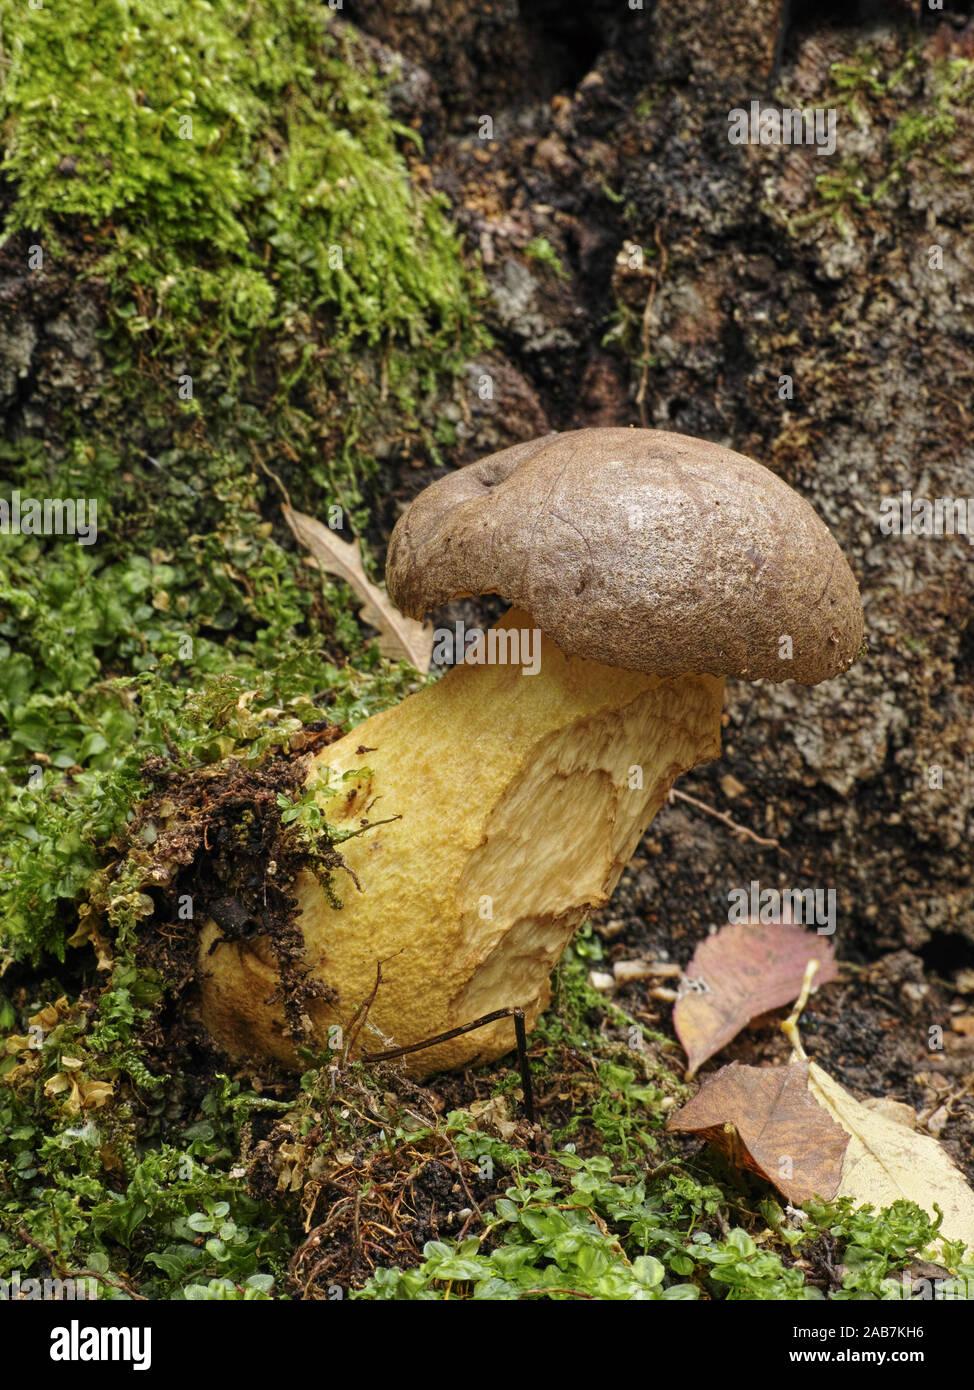 Form Steinpilz Länge : 6 cm Giessform 1 Pilz